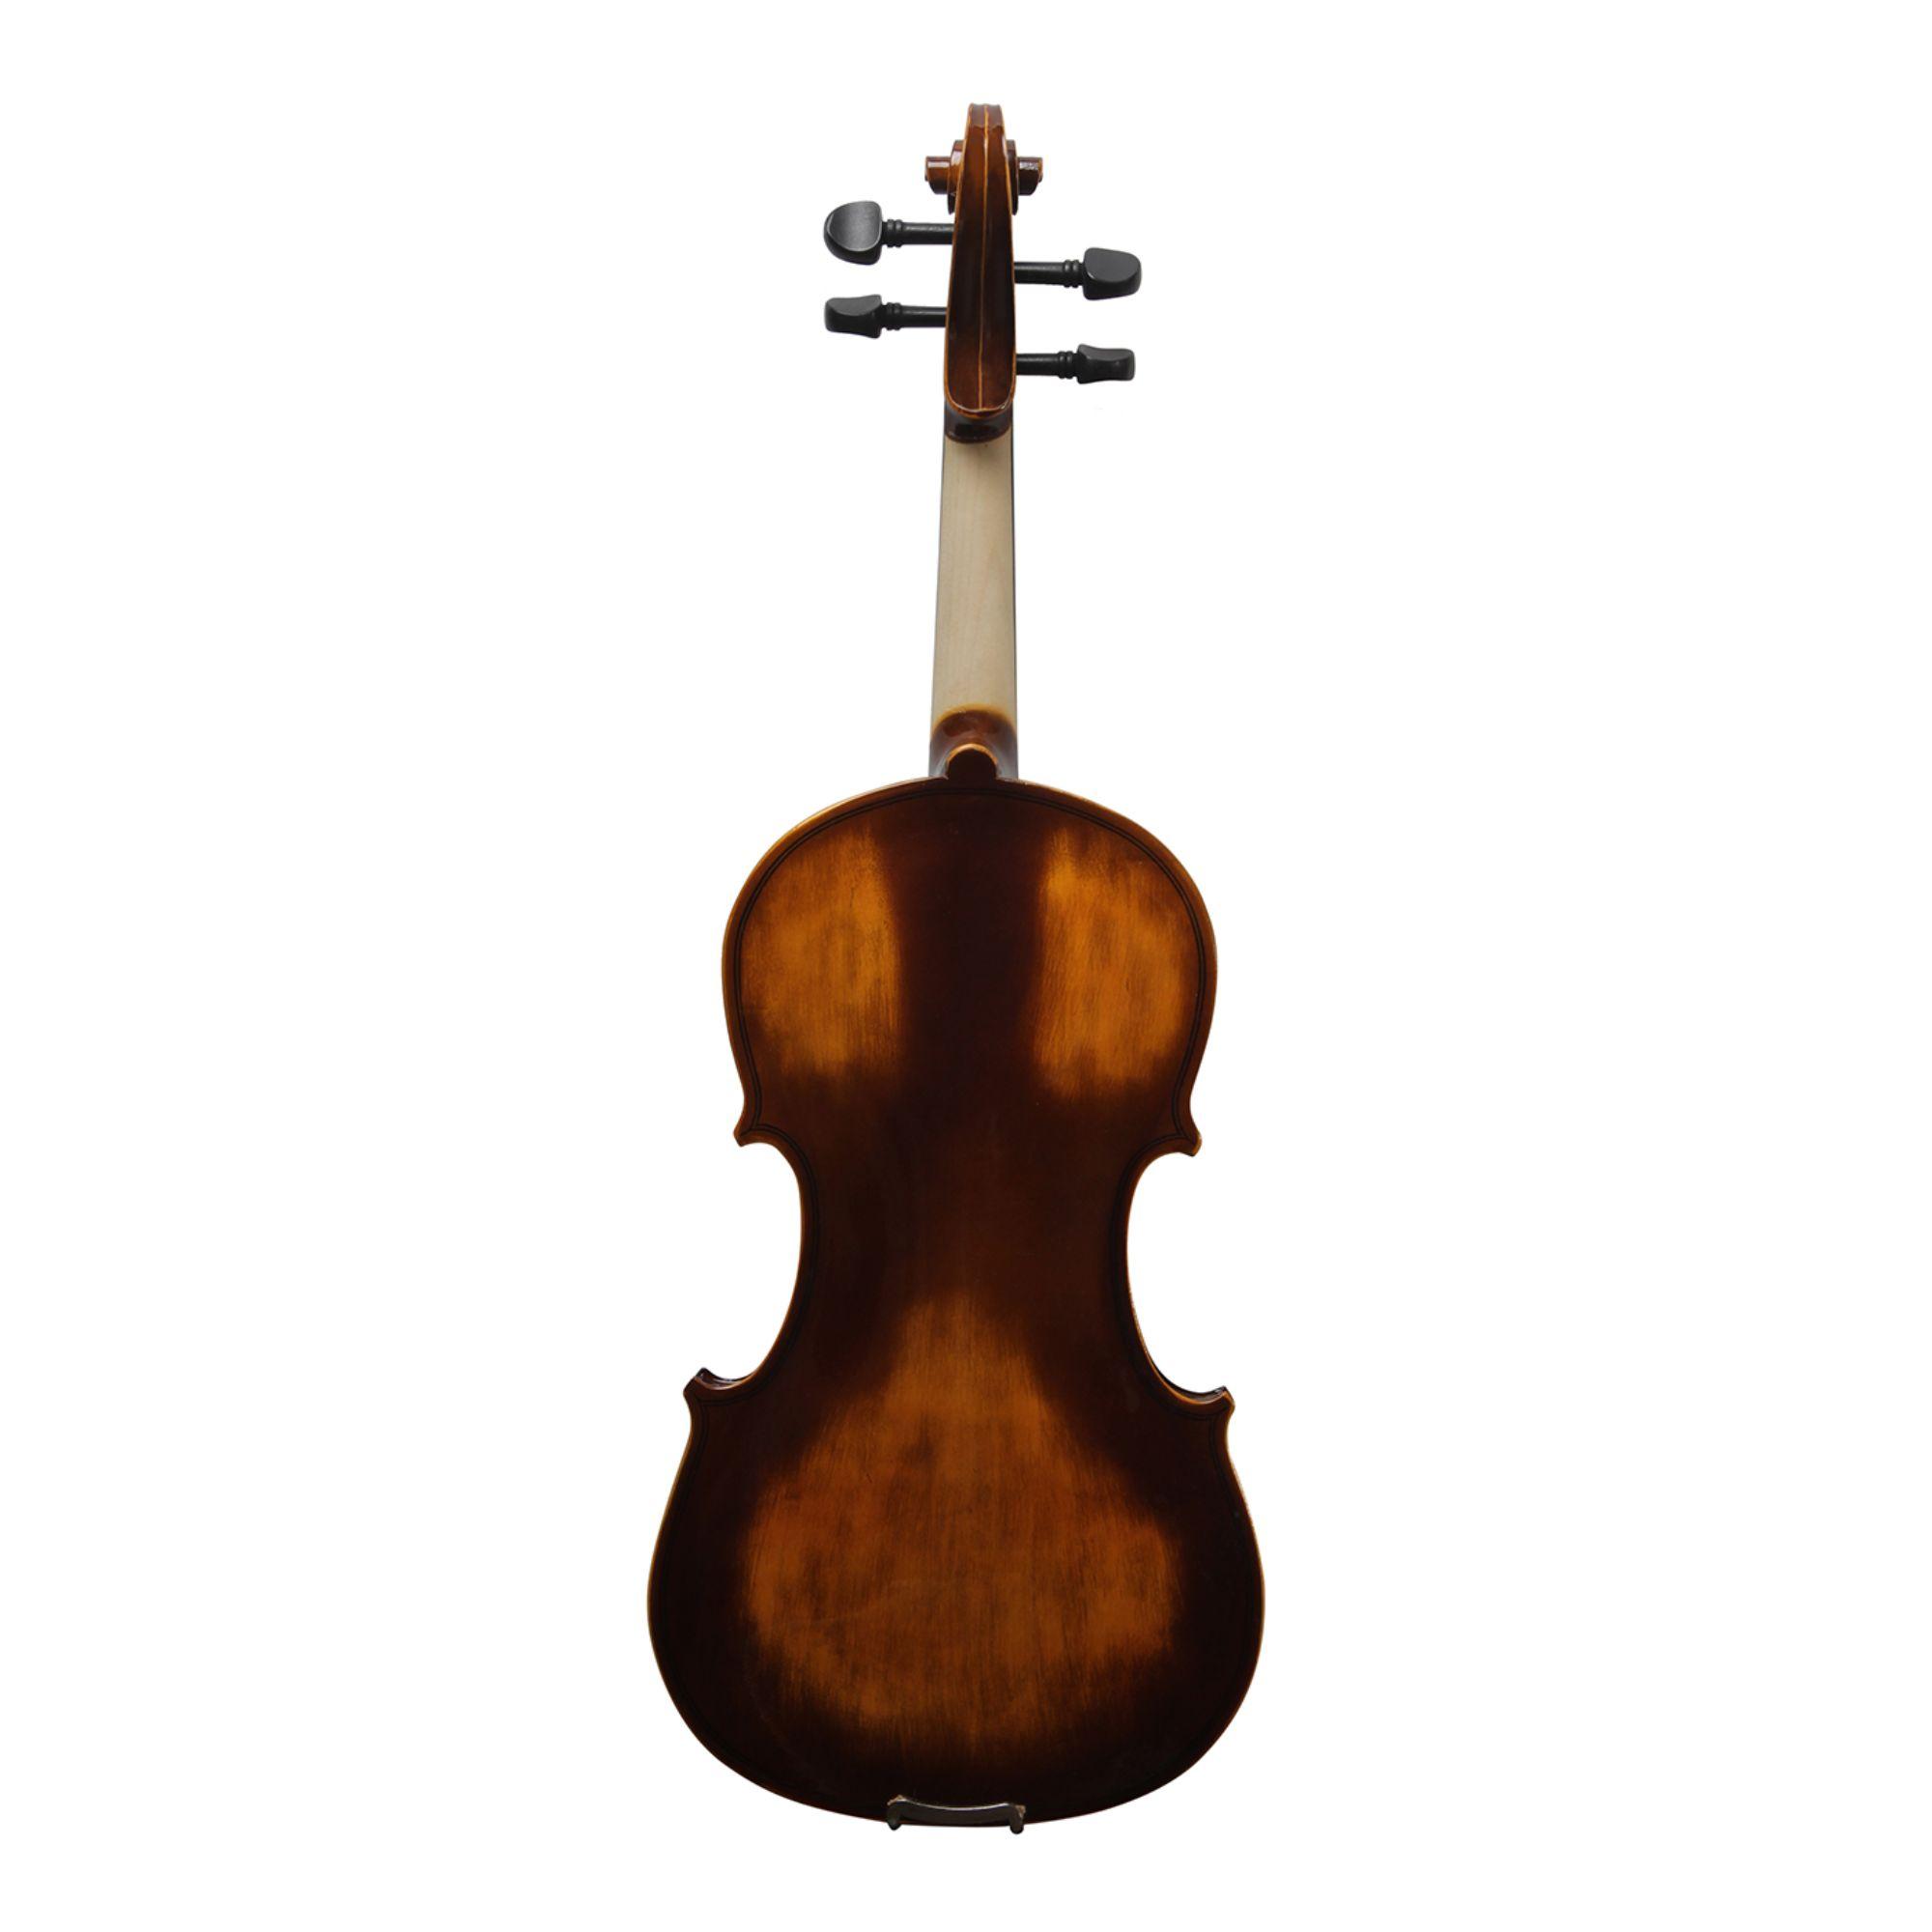 PR VS1 - Procraft Acoustic Violin